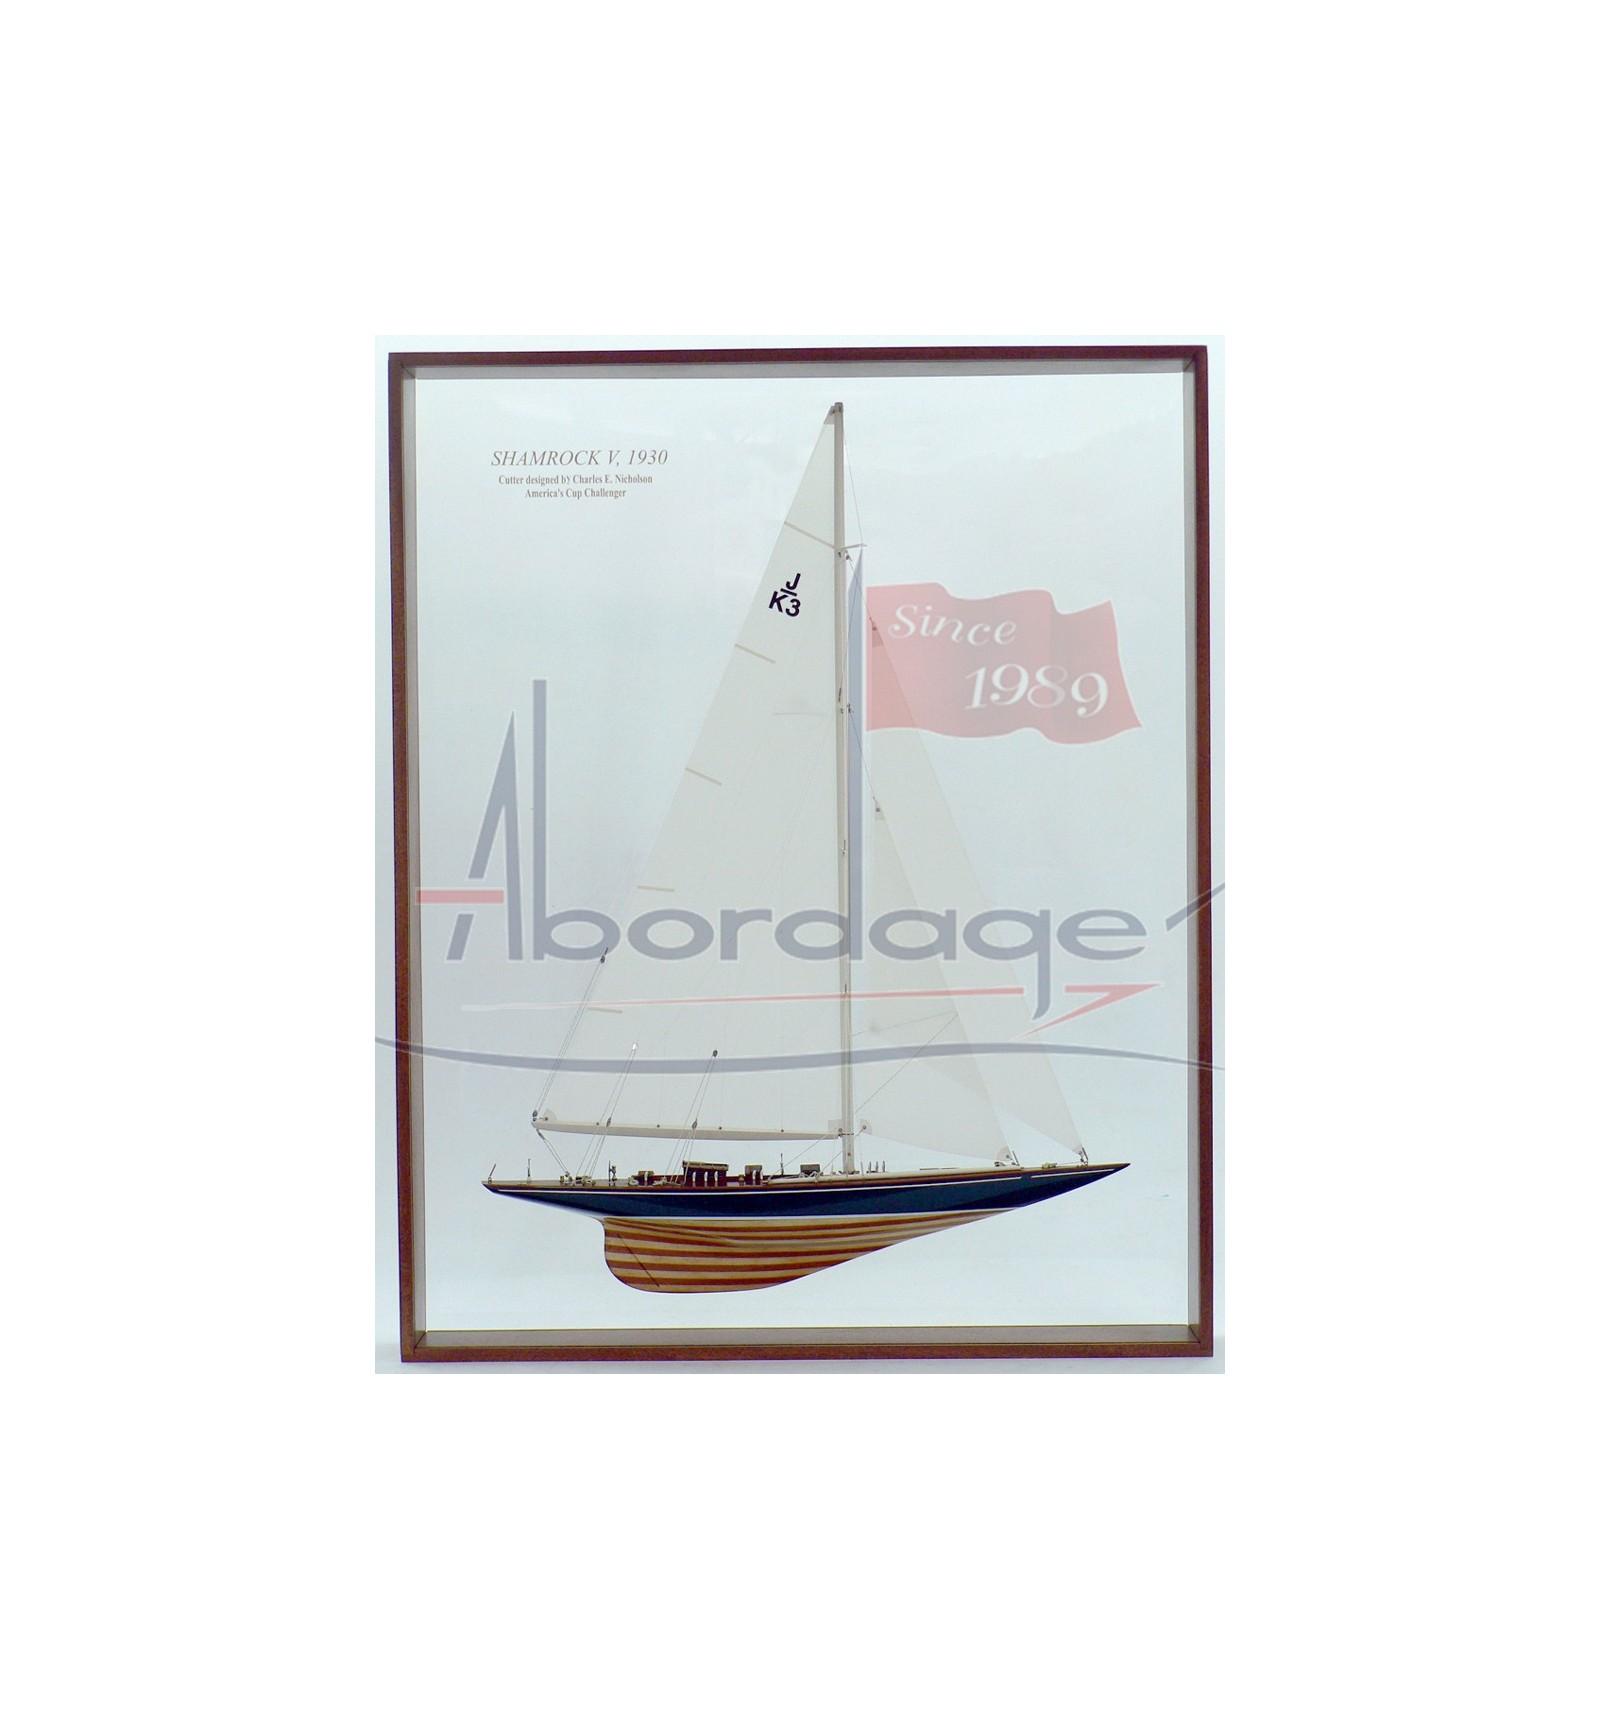 J Boats, Inc. Case Study Memo